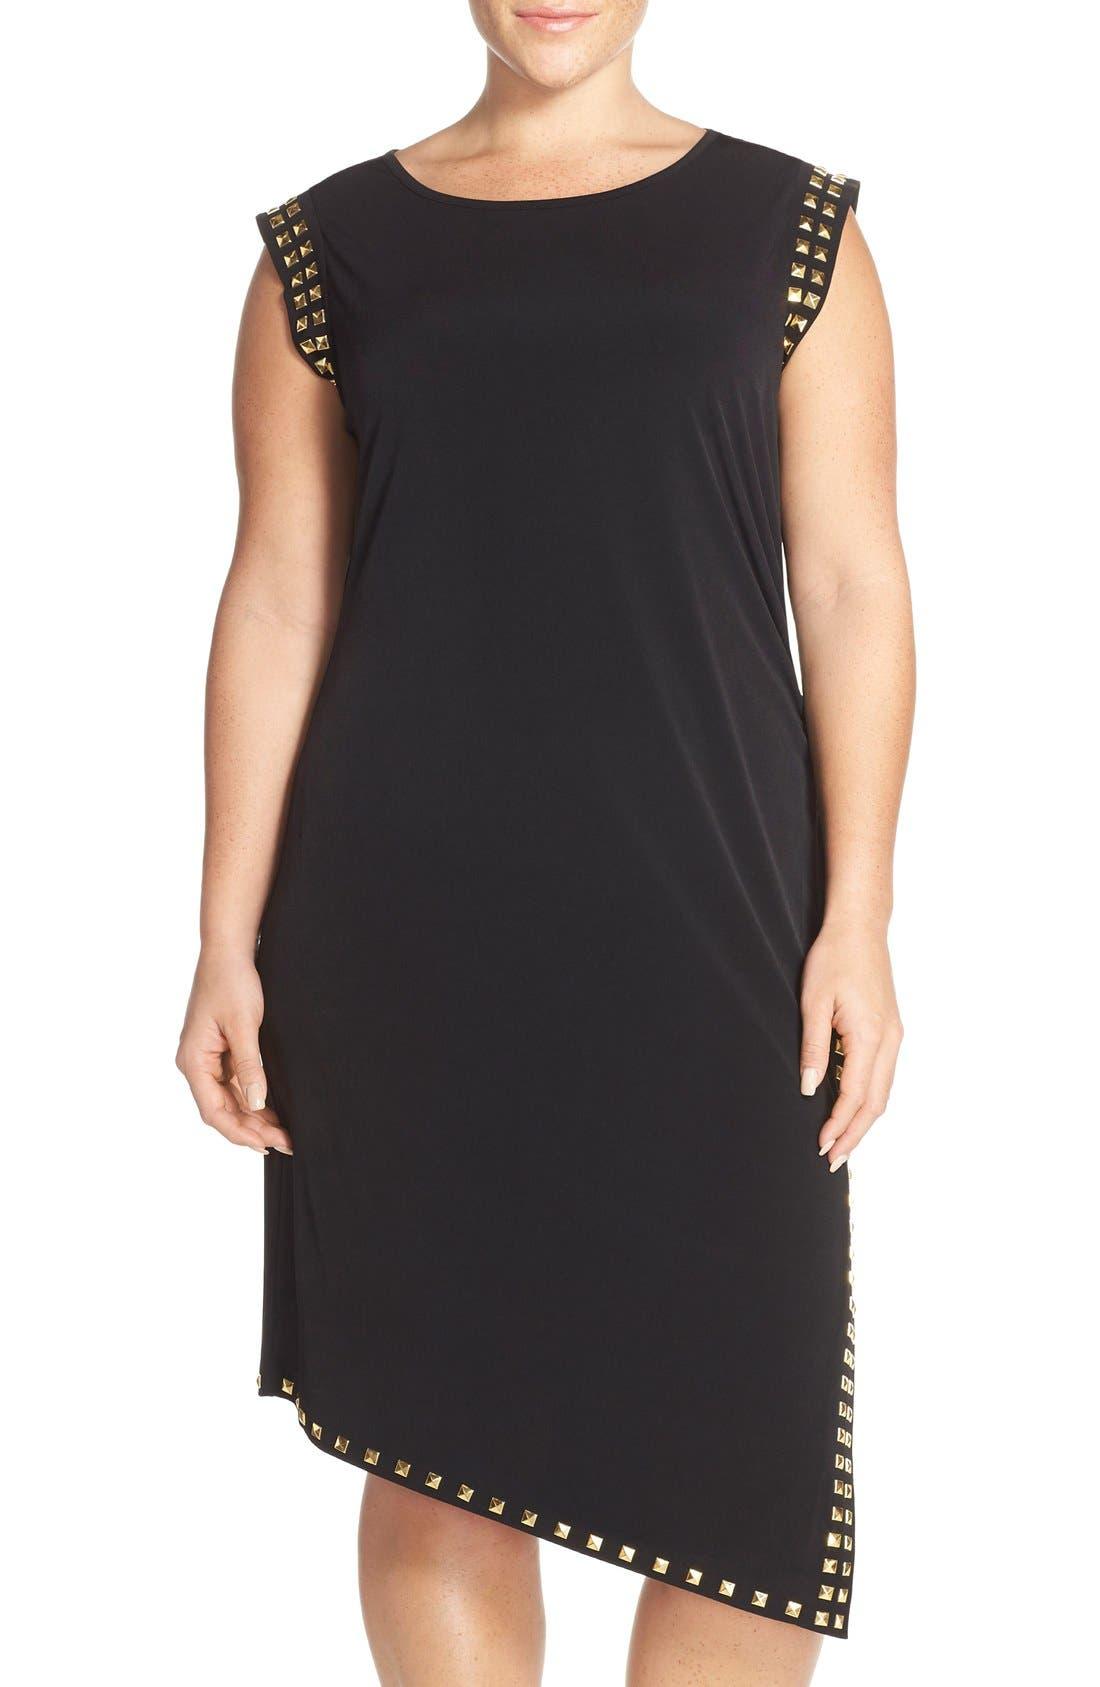 Studded Asymmetrical Shift Dress,                             Main thumbnail 1, color,                             Black/ Gold